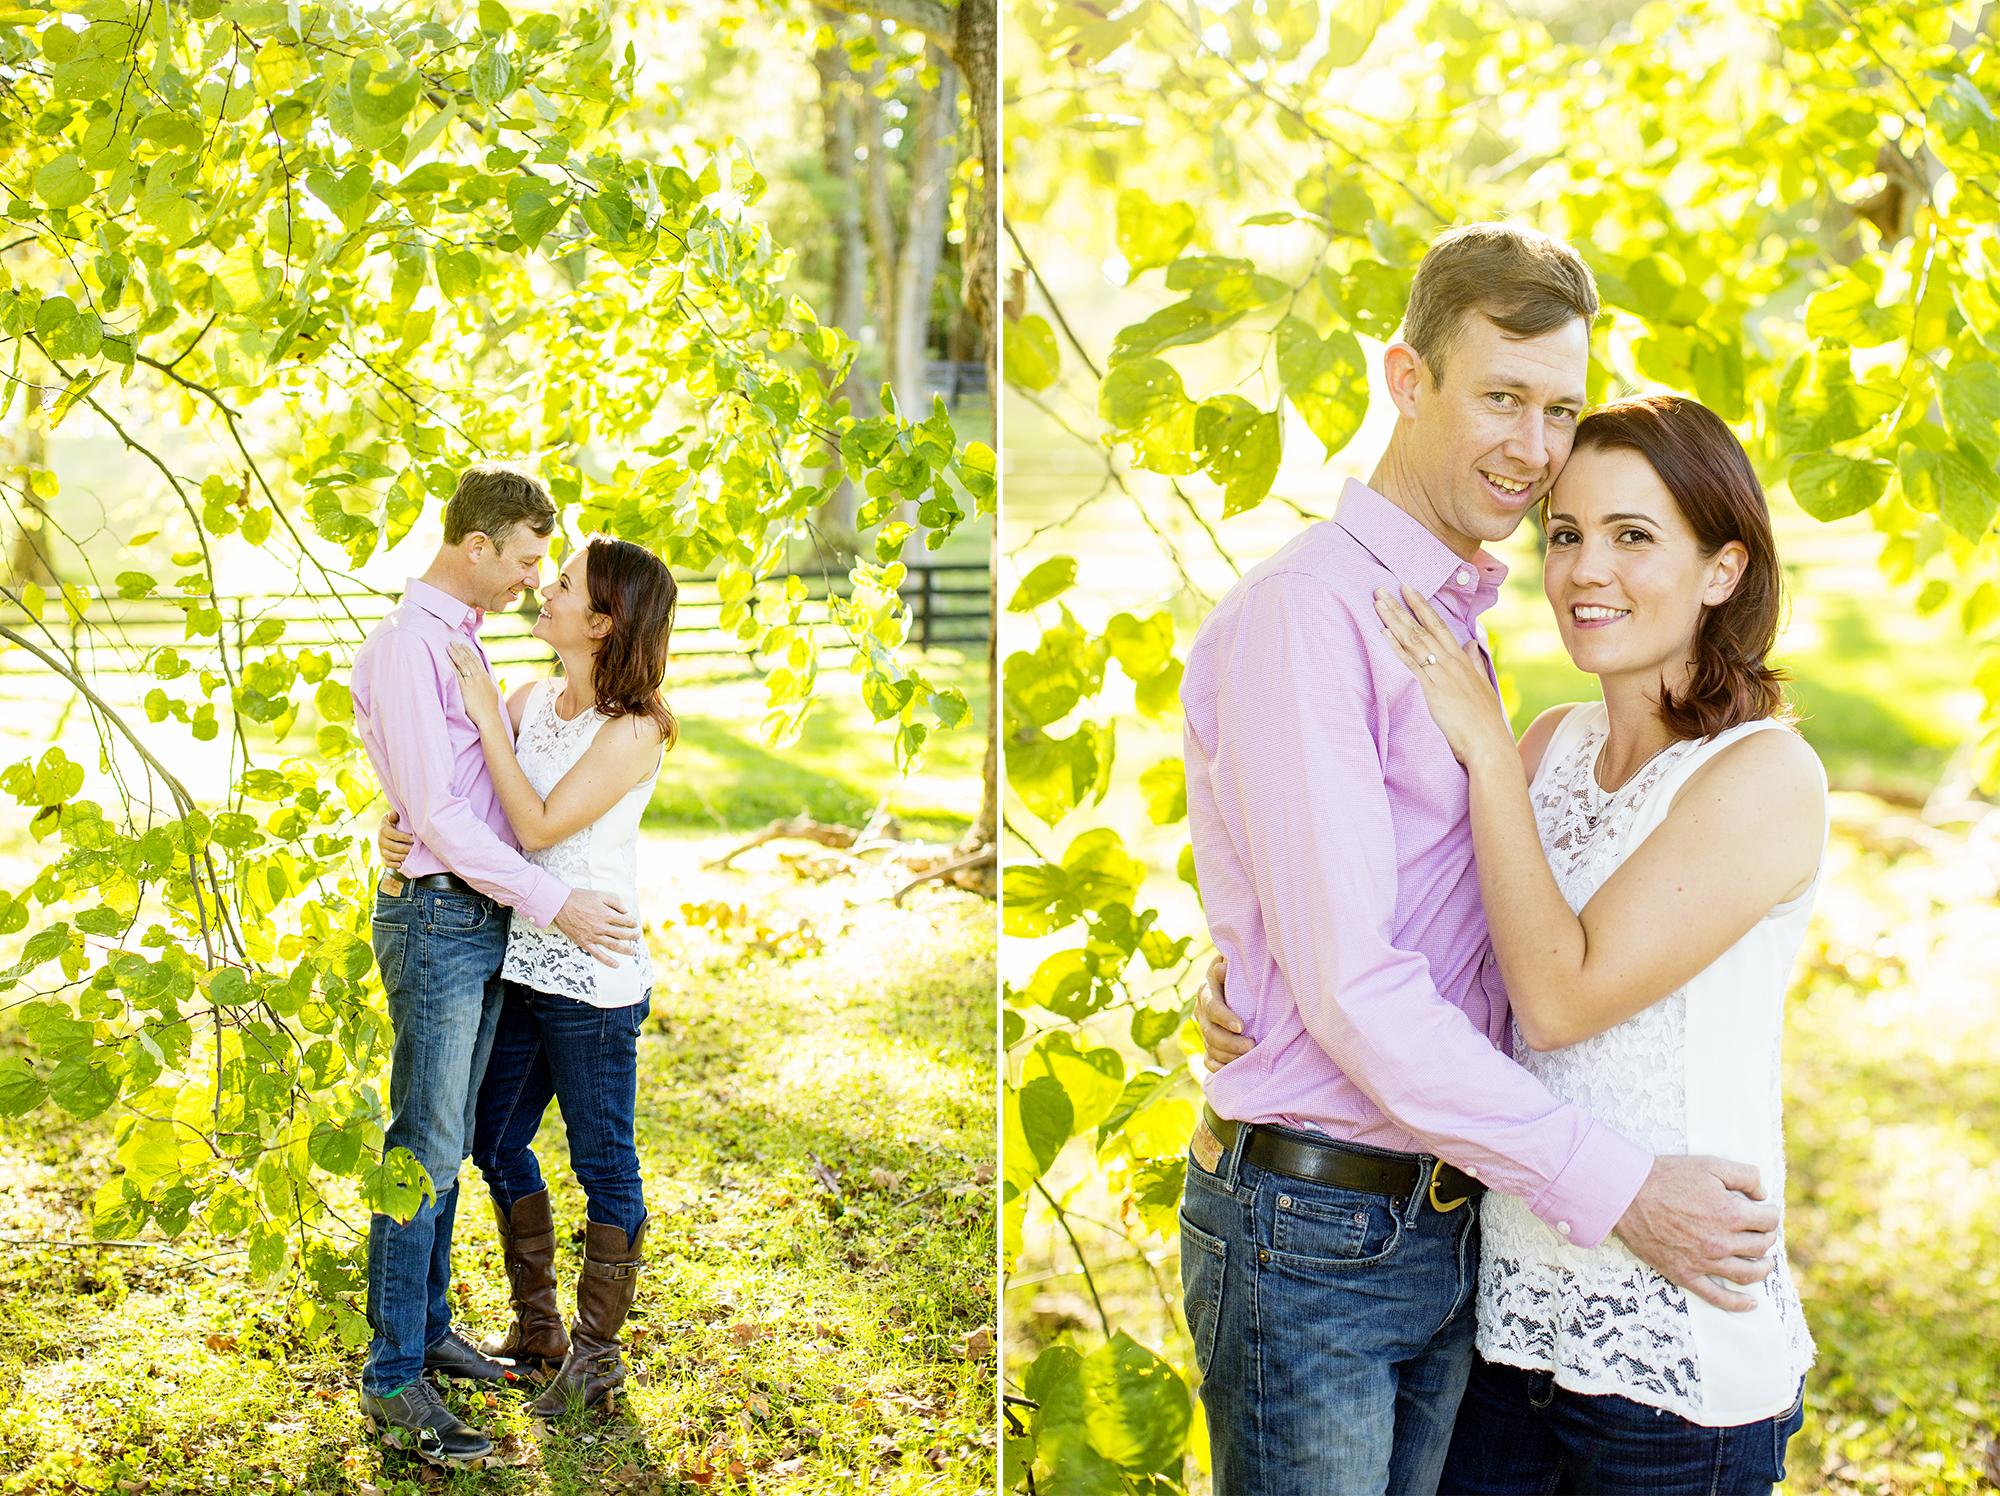 Seriously_Sabrina_Photography_Lexington_Kentucky_Burl_Winstar_Farm_Engagement_AliJerry_7.jpg